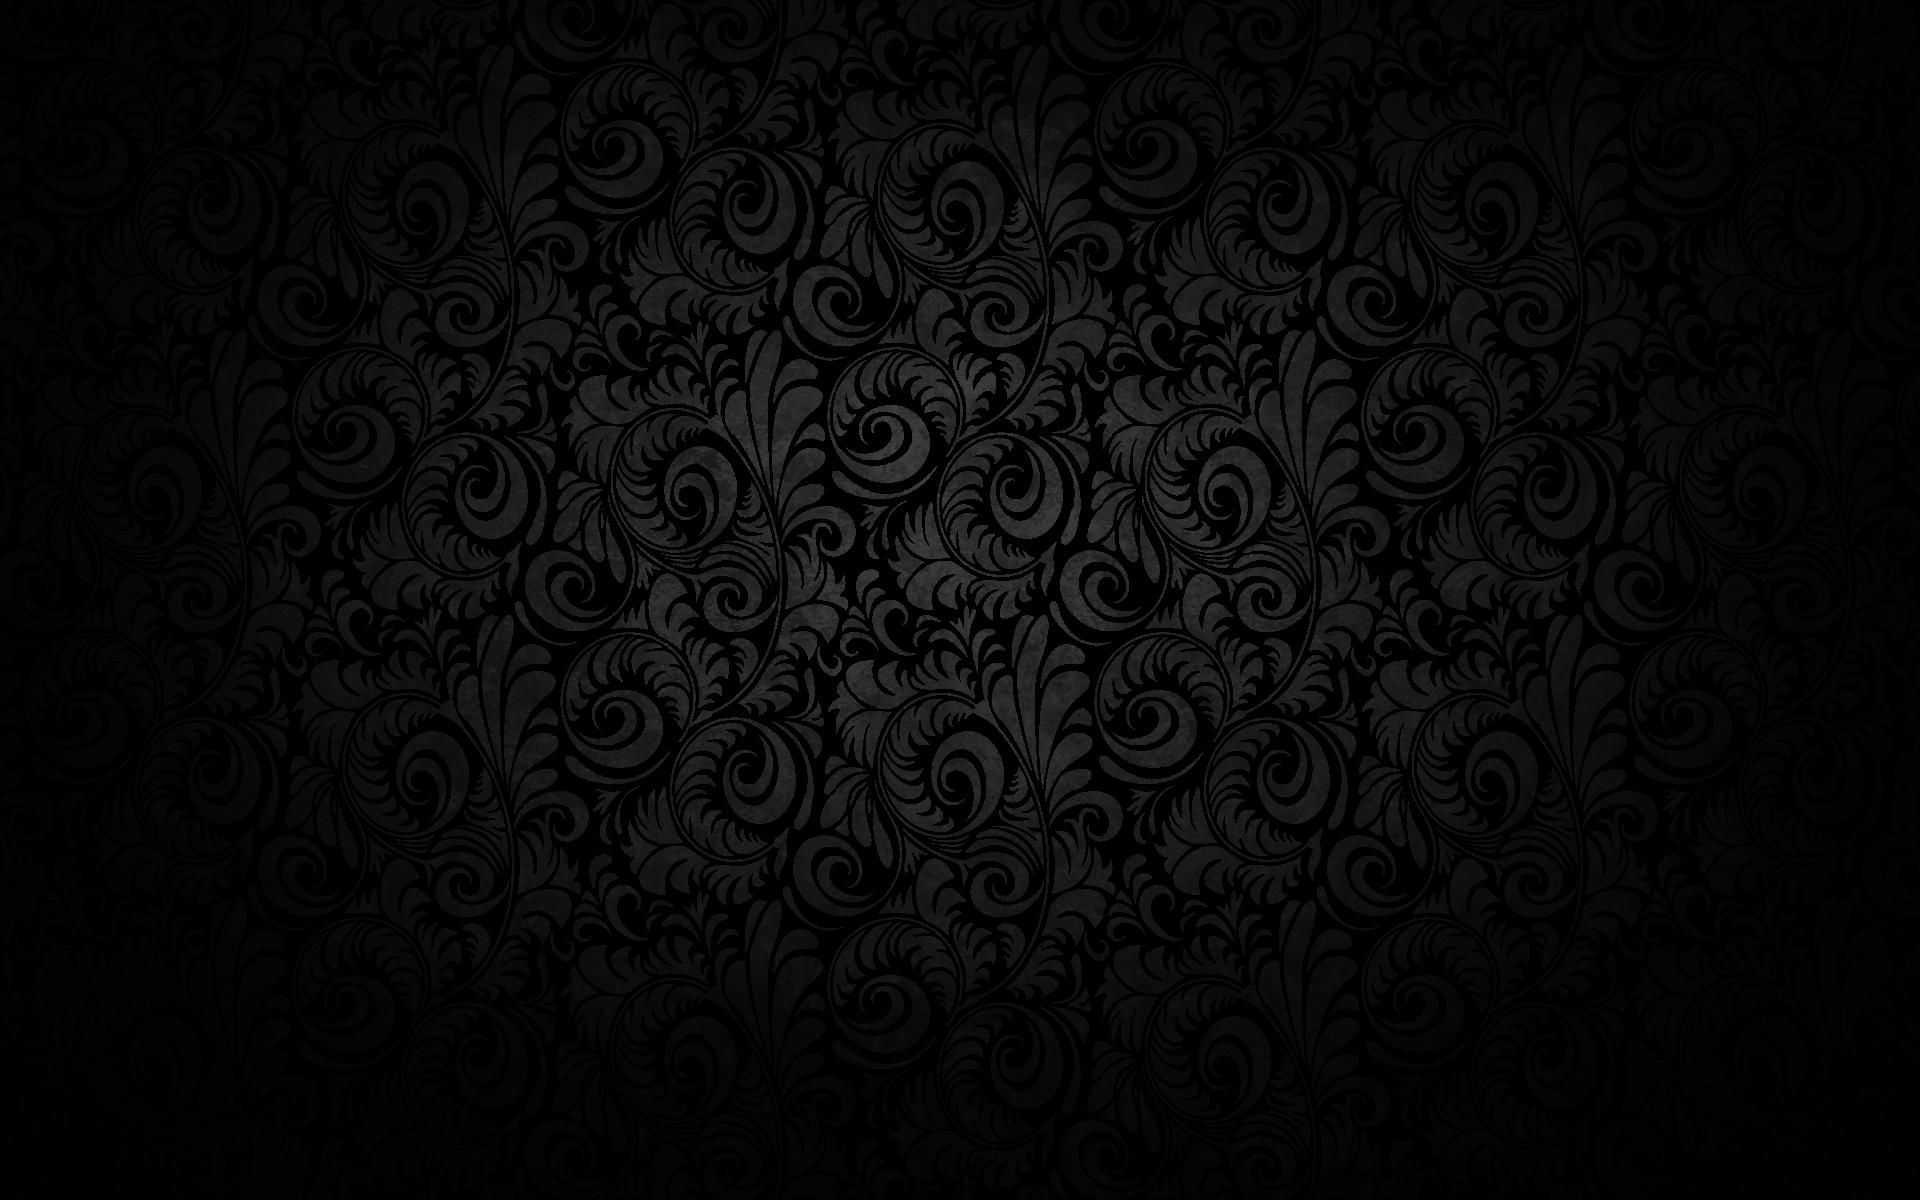 Hexagons textures grid chrome digital art nanosuit hexagons textures grid chrome digital art nanosuit photomanipulation 1920x1080 wallpaper amiket szvesen viselnk pinterest wallpaper digital voltagebd Images